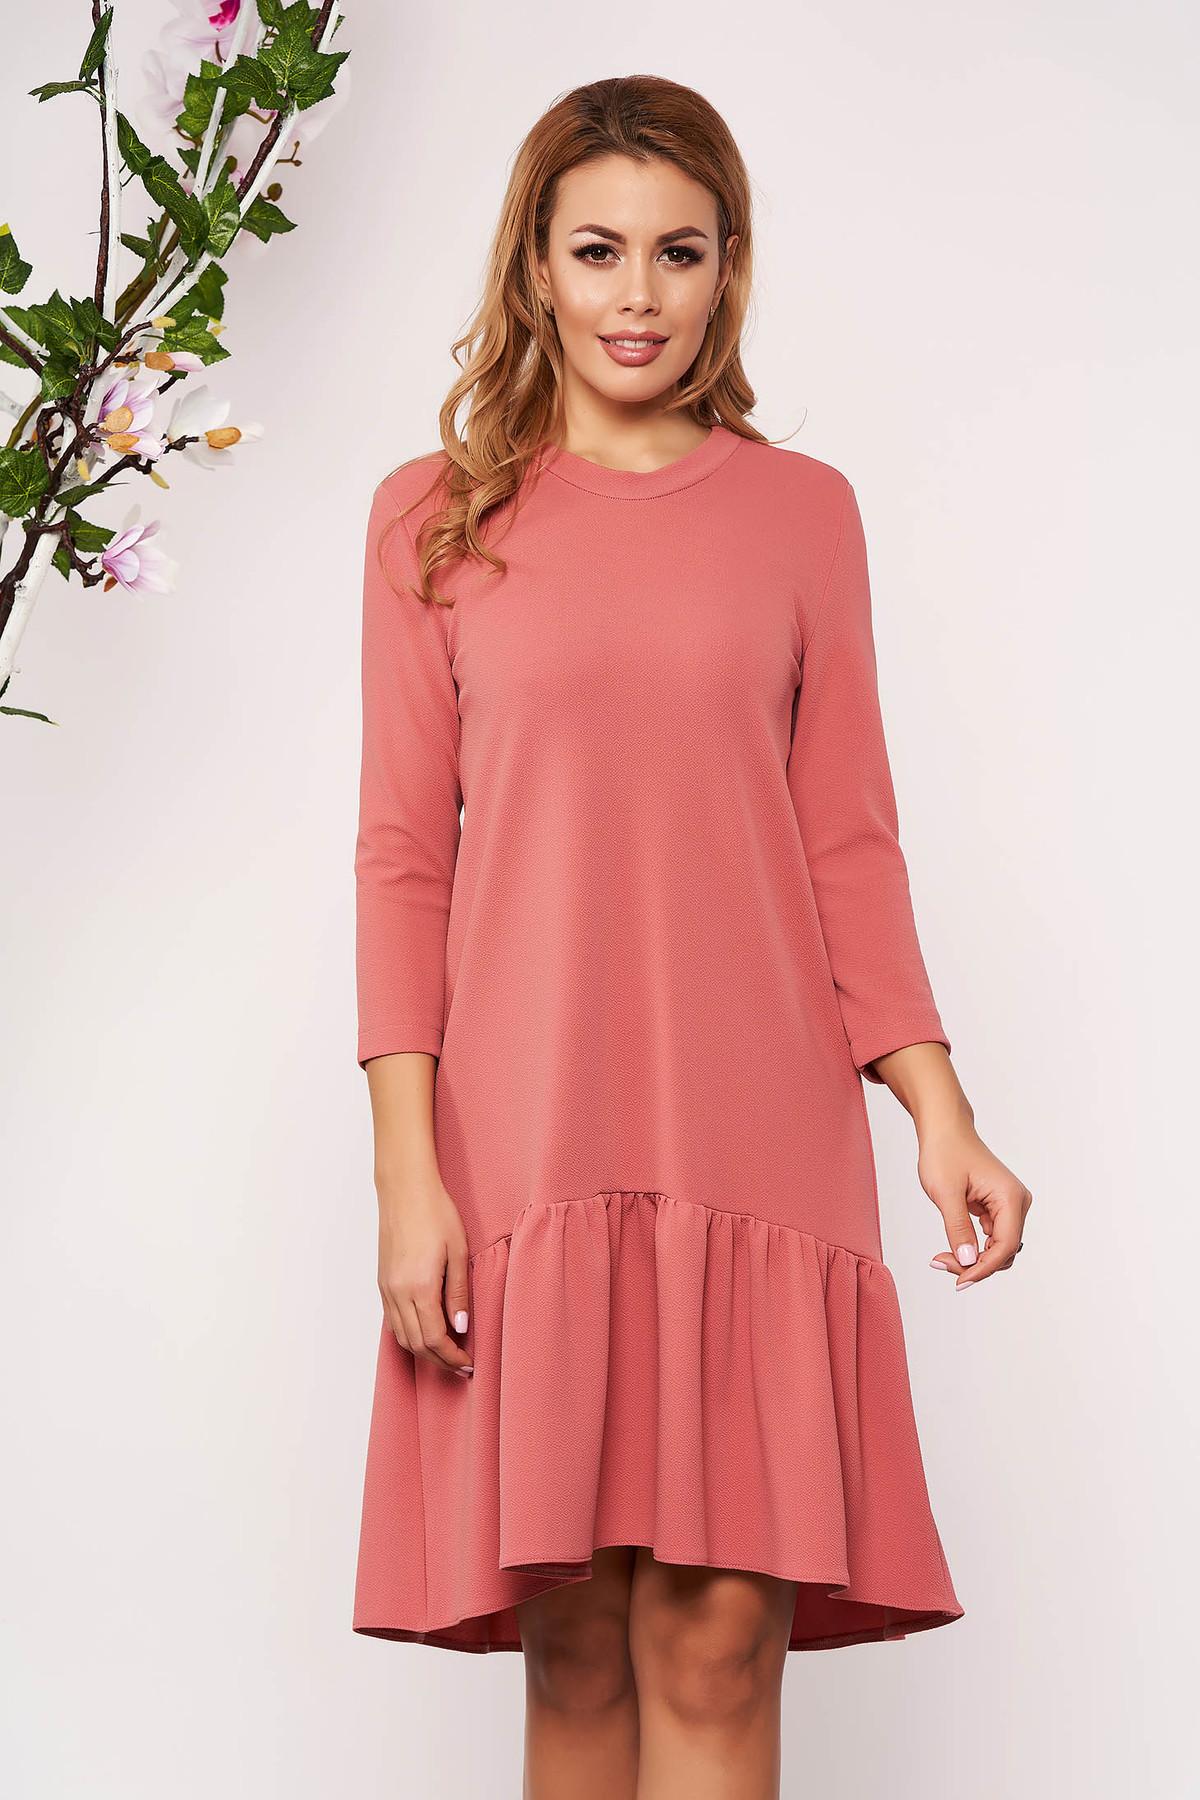 Rochie StarShinerS roz de zi cu croi larg fara captuseala cu maneci trei-sferturi si volanase la baza rochiei